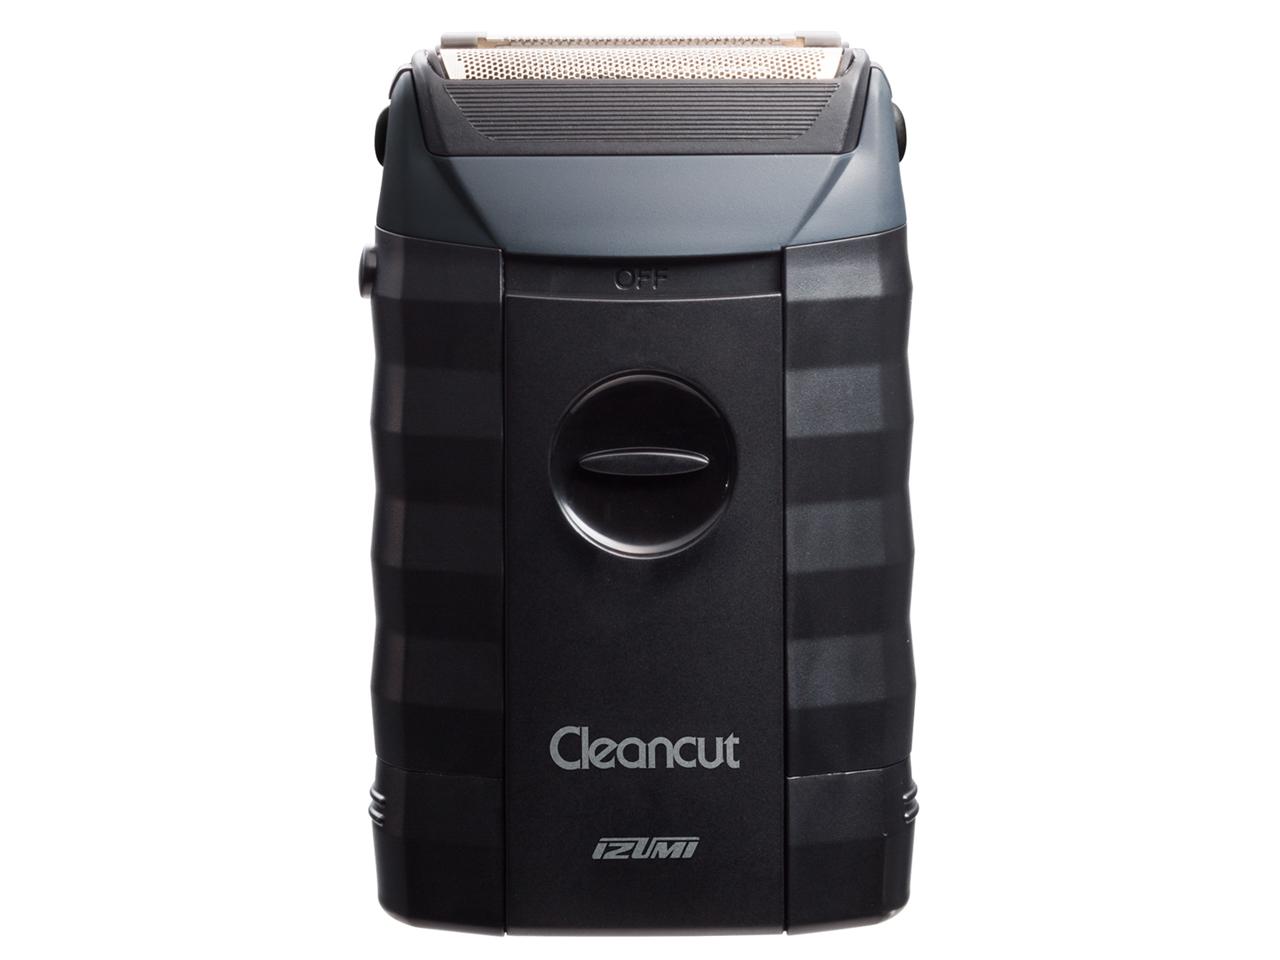 Cleancut IZF-303